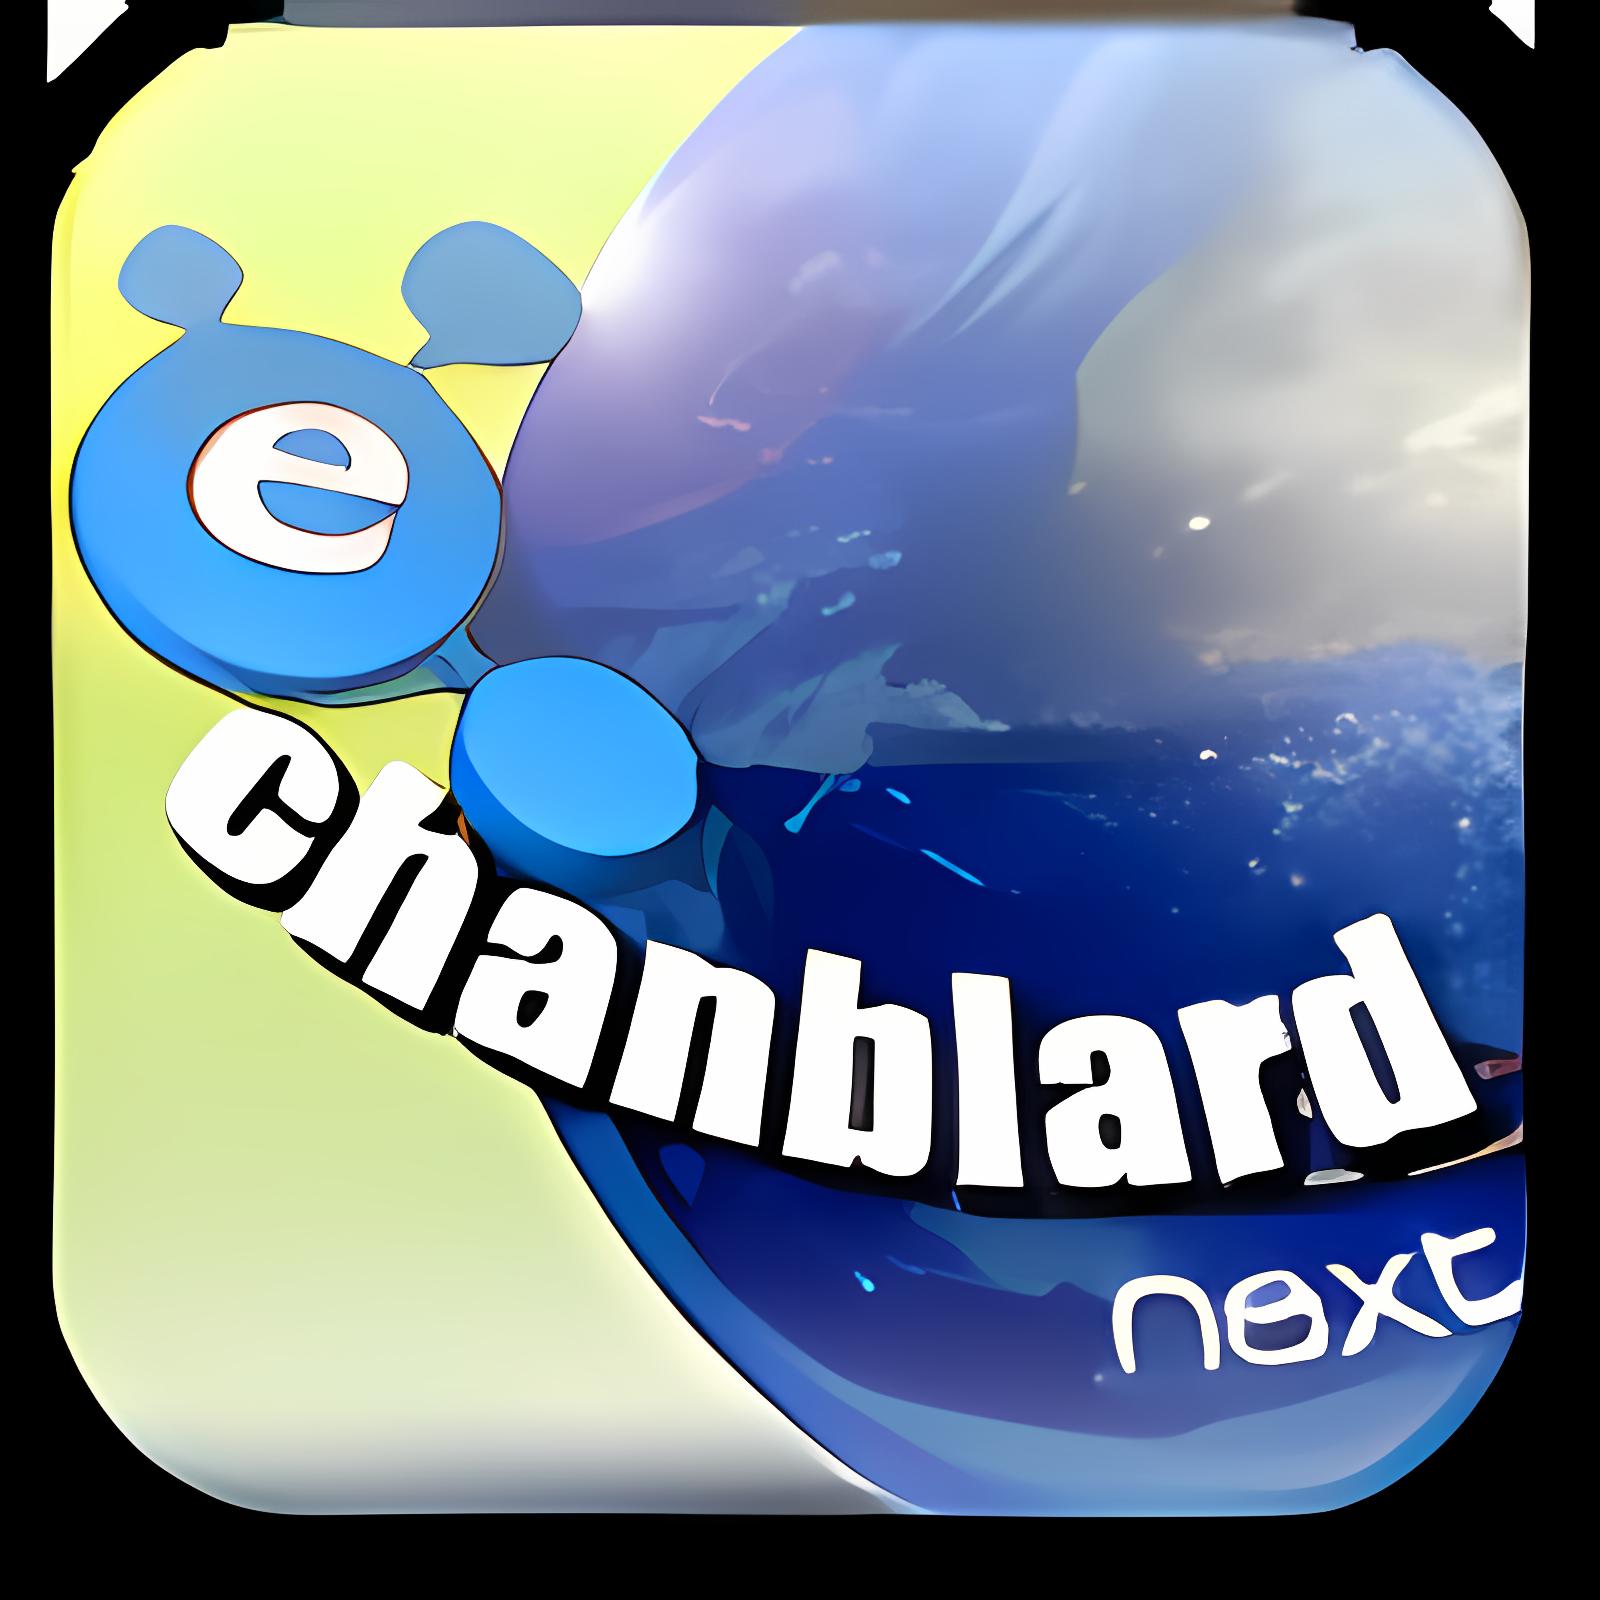 eChanblardNext